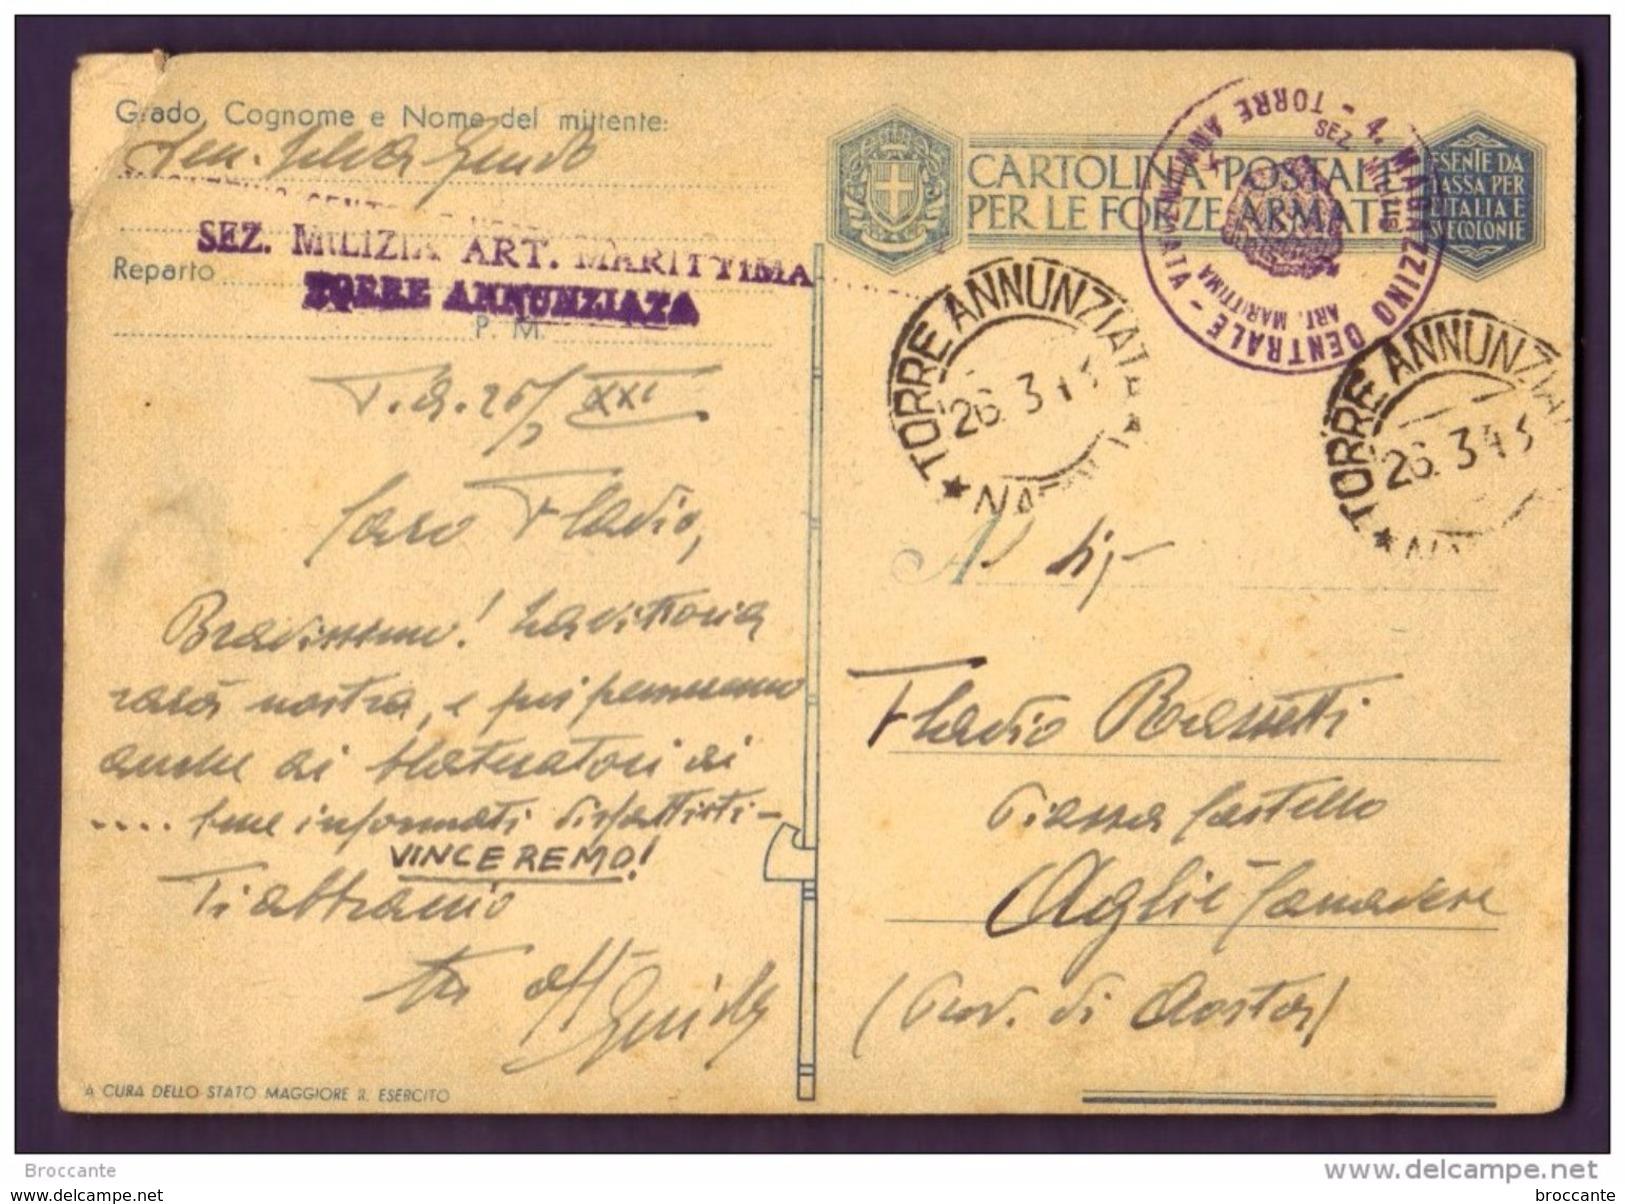 1943 SEZ. MILIZIA ART MARITTIMA TORRE A. X AOSTA - CARTOLINA  PER LE FORZE ARMATE - FRANCHIGIA - BASSORILIEVO - 1900-44 Vittorio Emanuele III